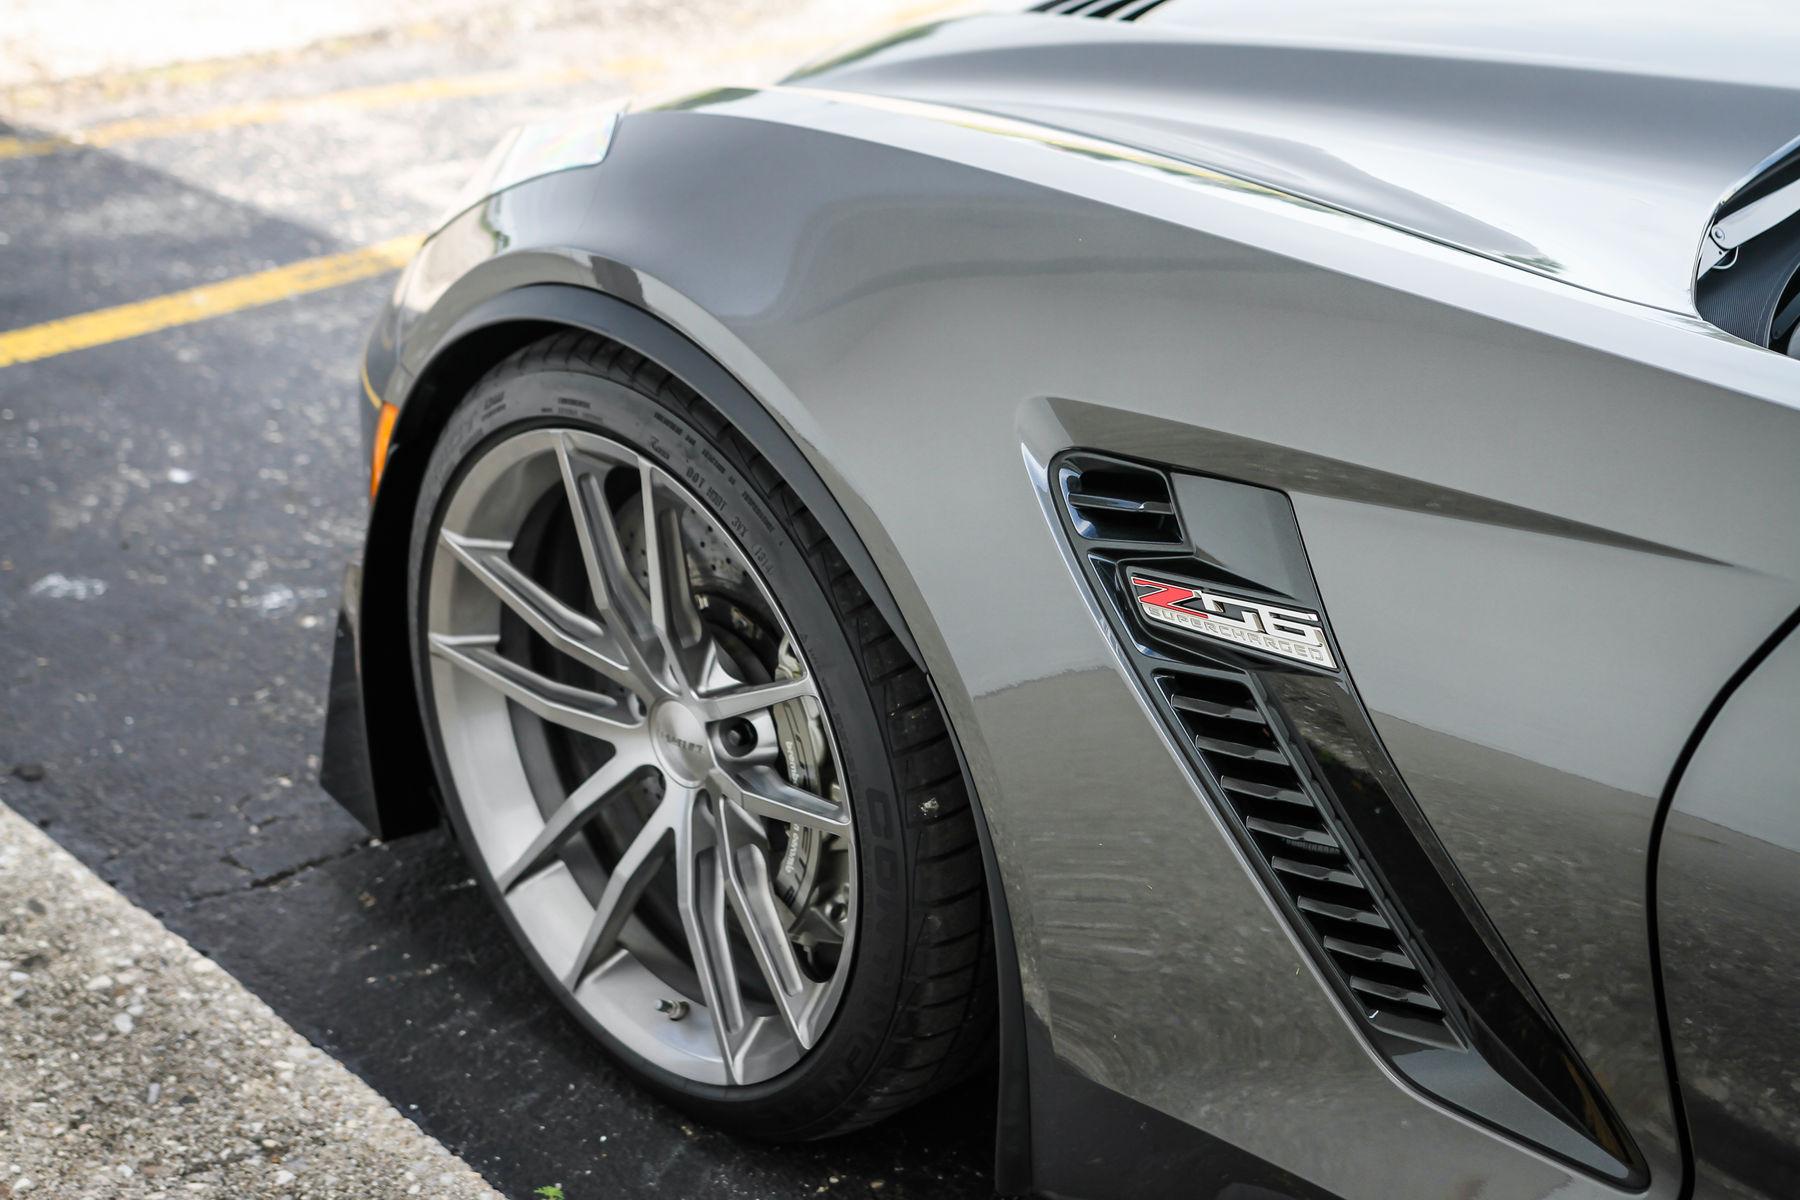 2015 Chevrolet Corvette Z06 | Forgeline C7 Corvette Z06 - View Of The AR1 Wheels